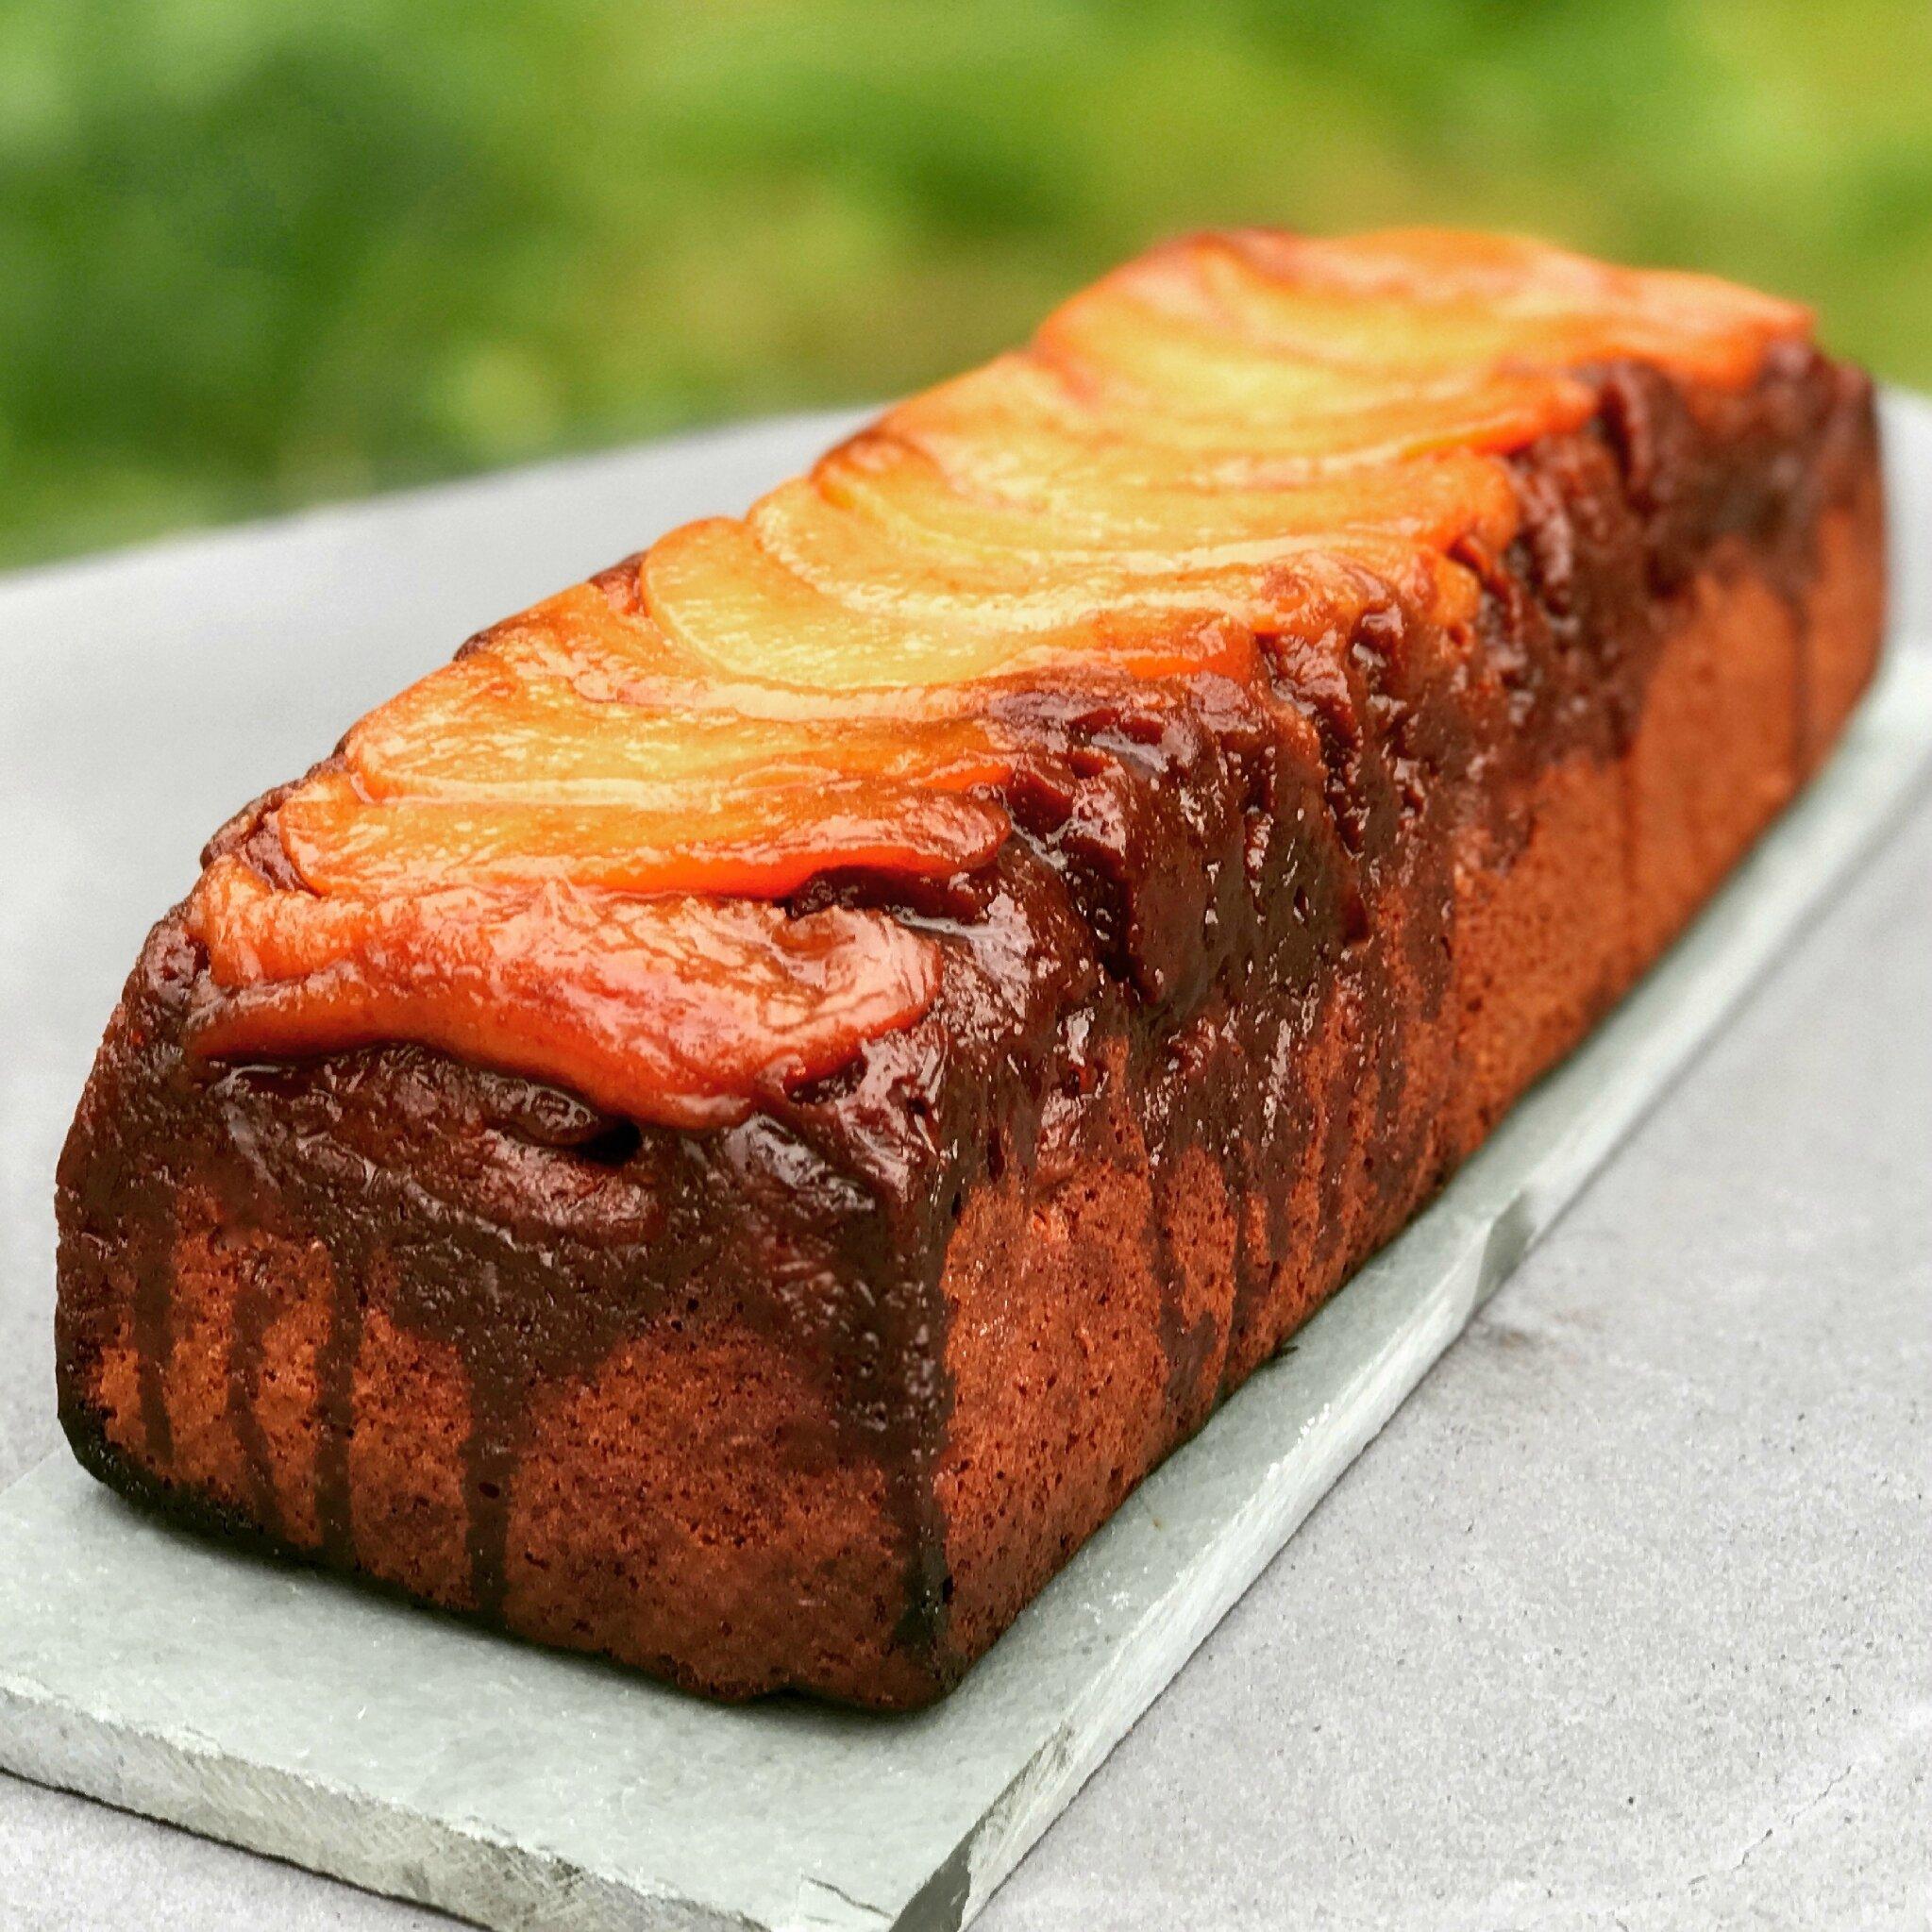 Le Cake Choco-Poires au caramel